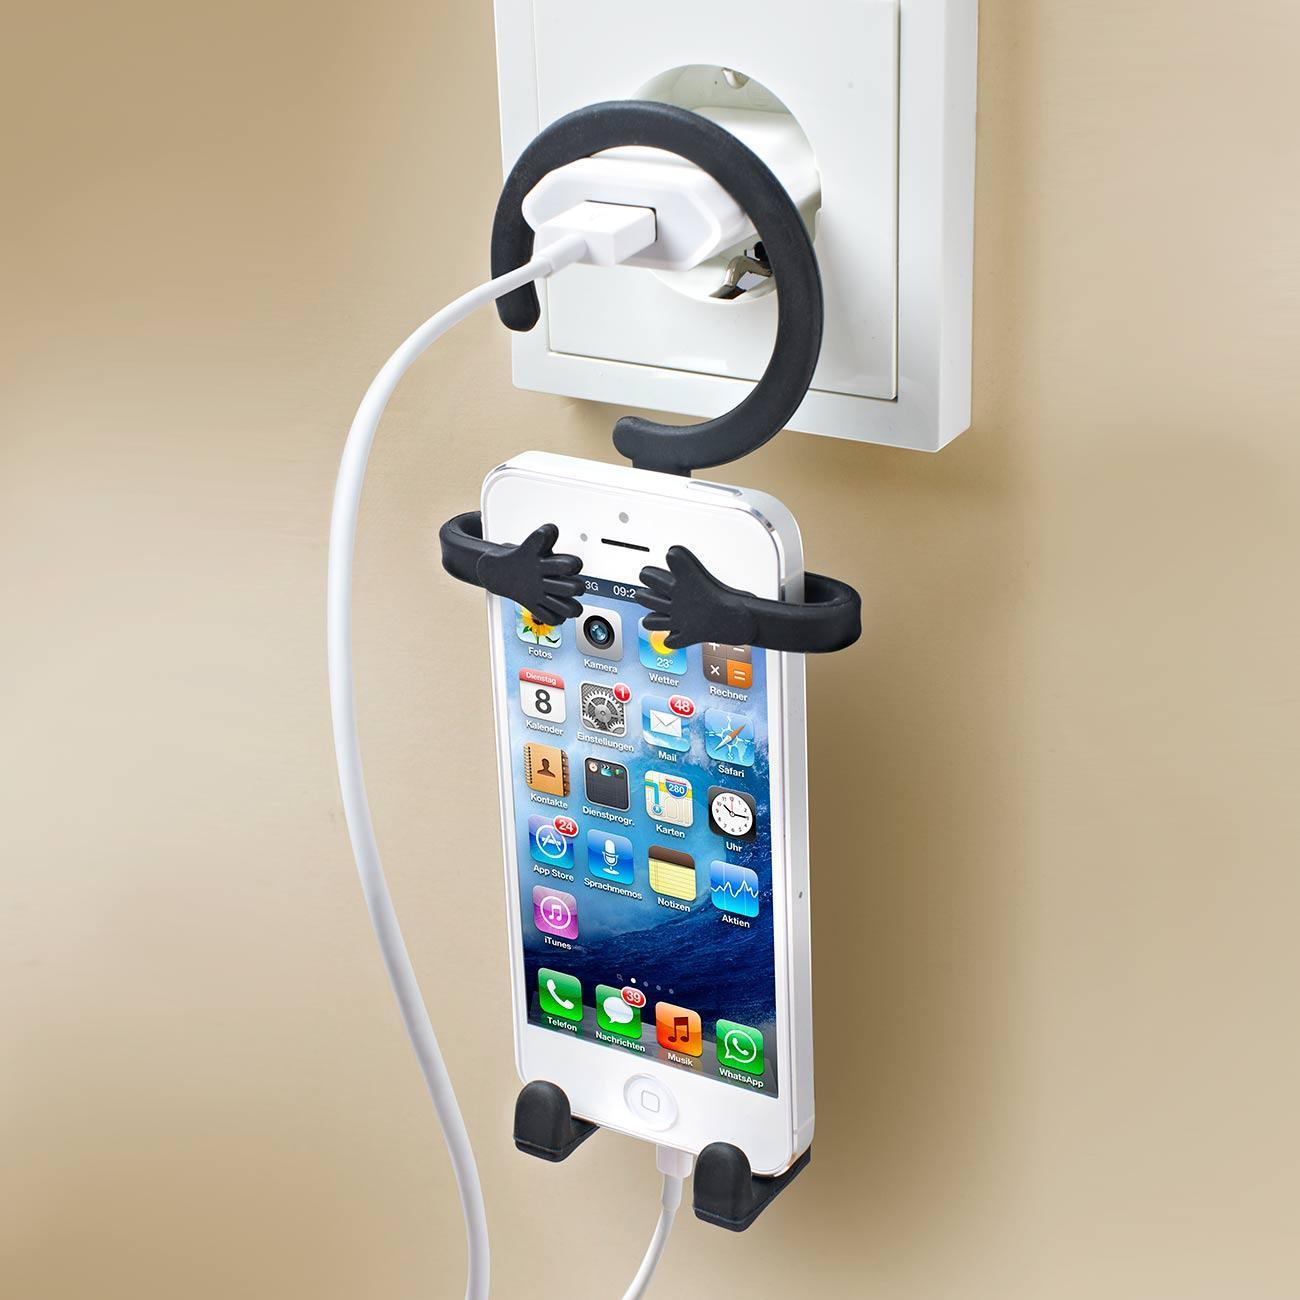 acheter majordome pour smartphone bondi en ligne pas cher. Black Bedroom Furniture Sets. Home Design Ideas